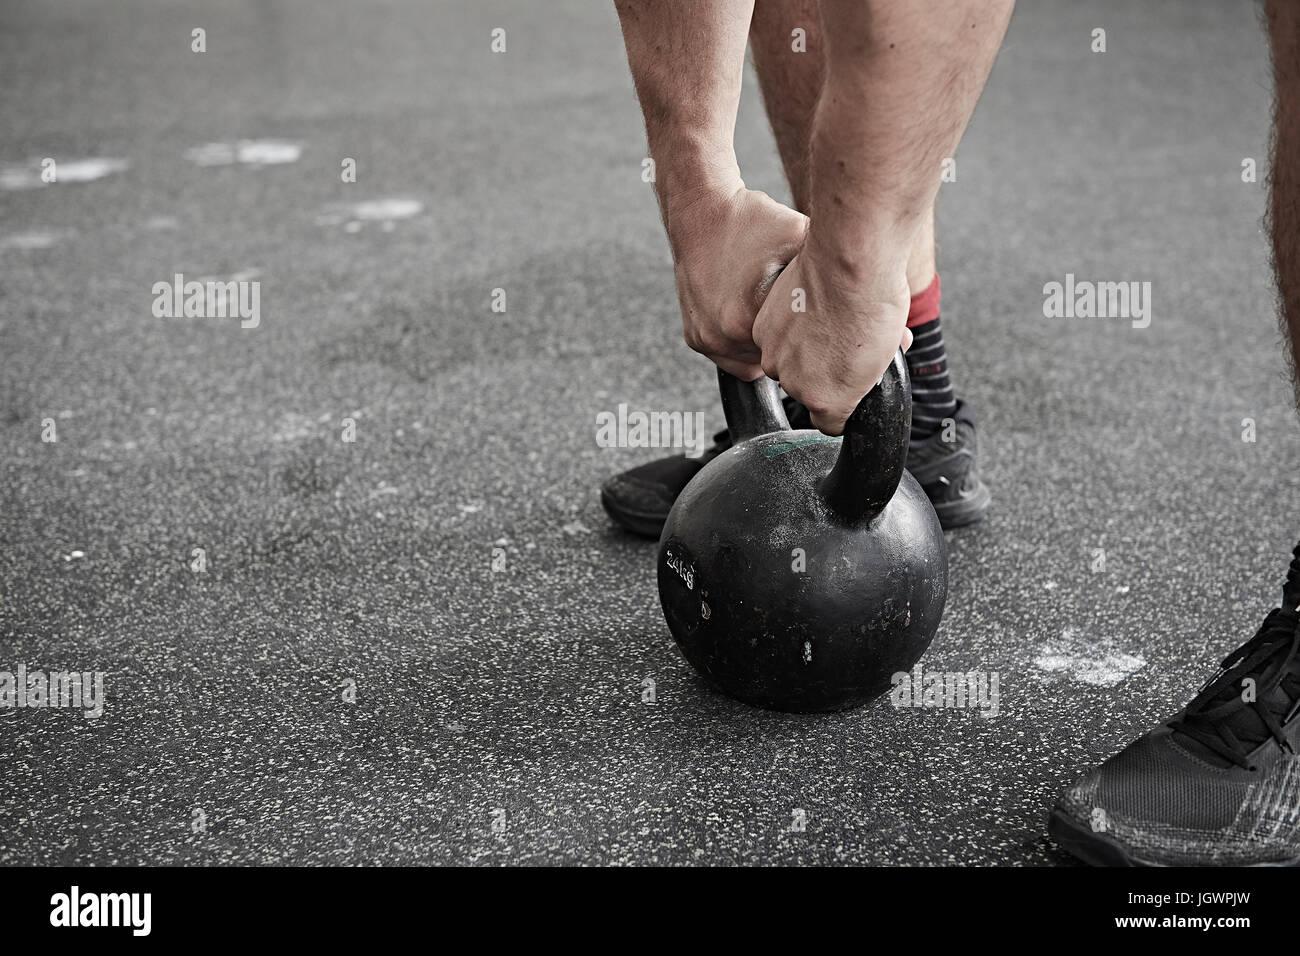 Man lifting kettlebell in cross training gym - Stock Image